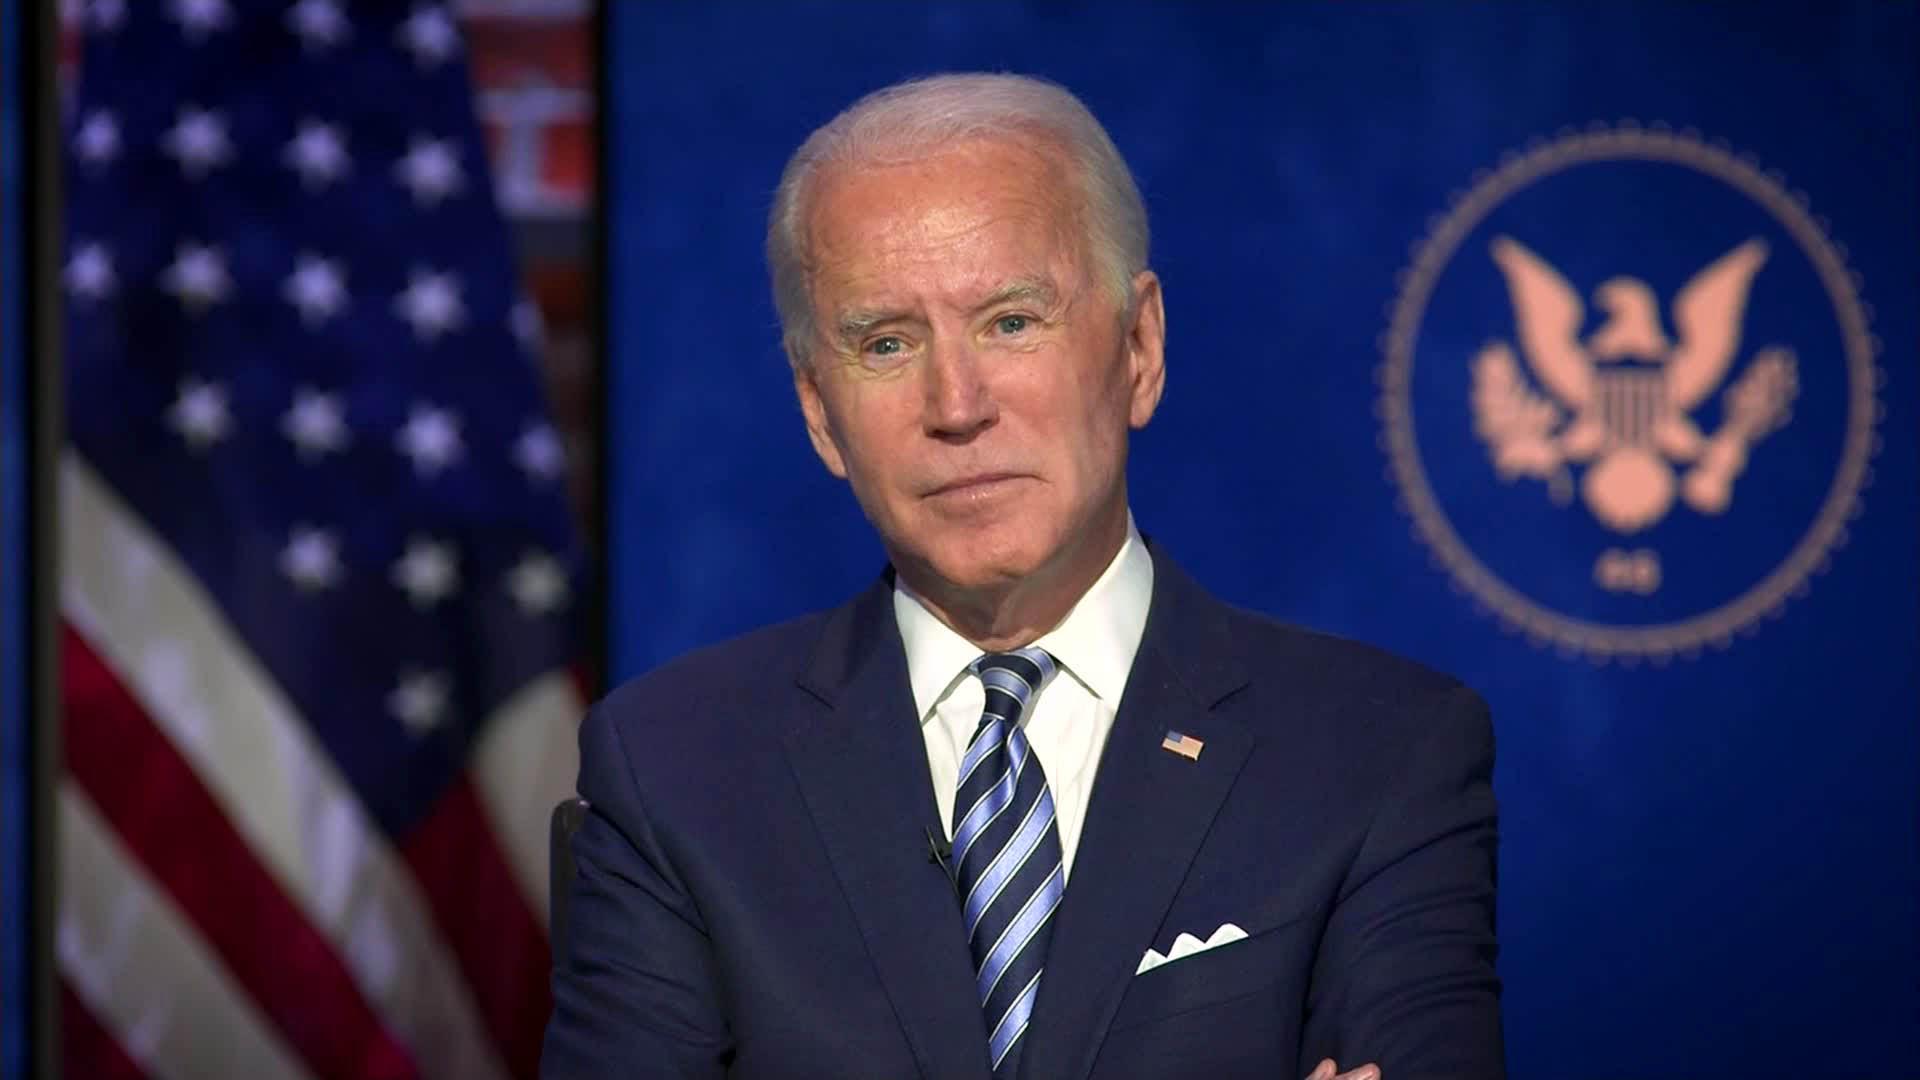 Biden says multiple Republican senators have called to congratulate him on election win